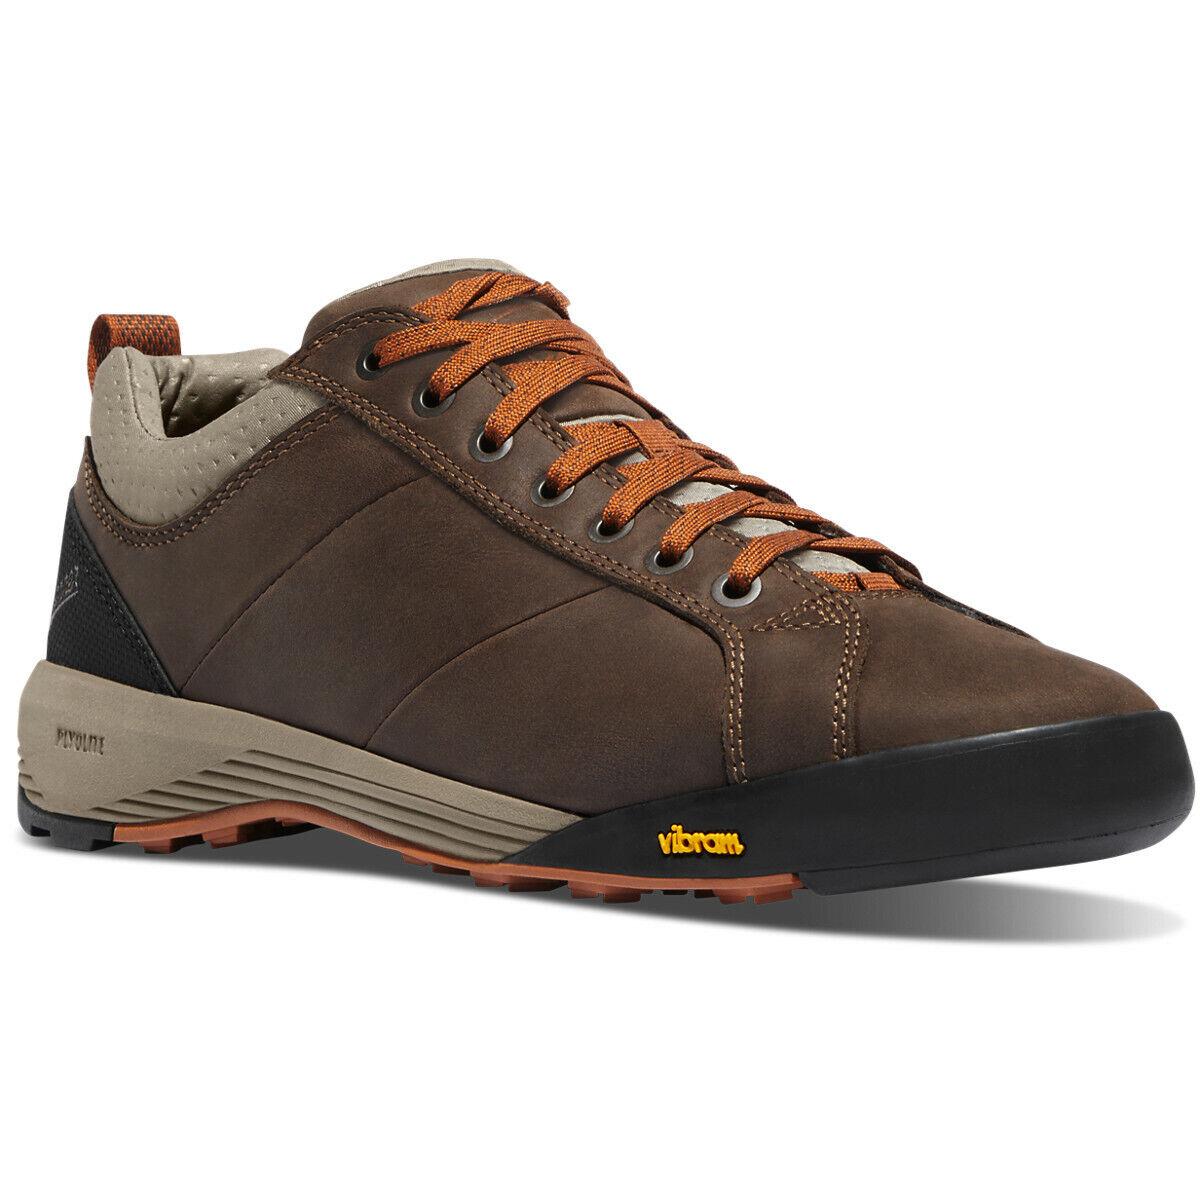 Danner Mens Camp Sherman Lightweight Trail Hiking zapatos Talla 8.5 D marrón naranja